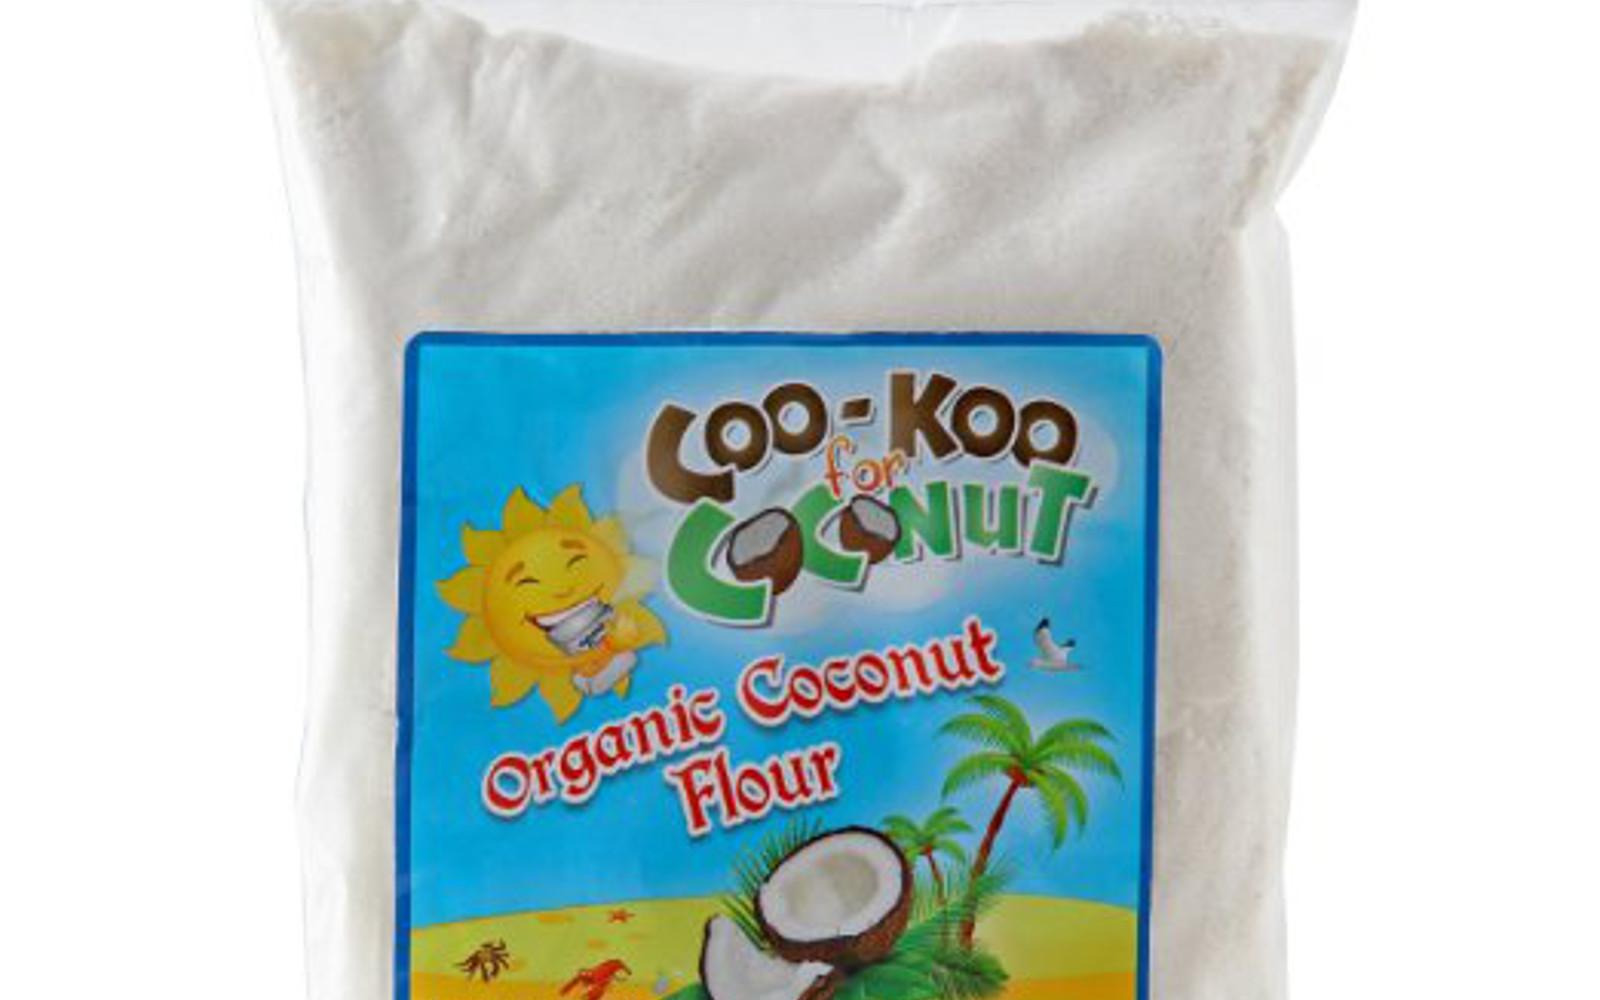 Coo Koo Coconut Flour